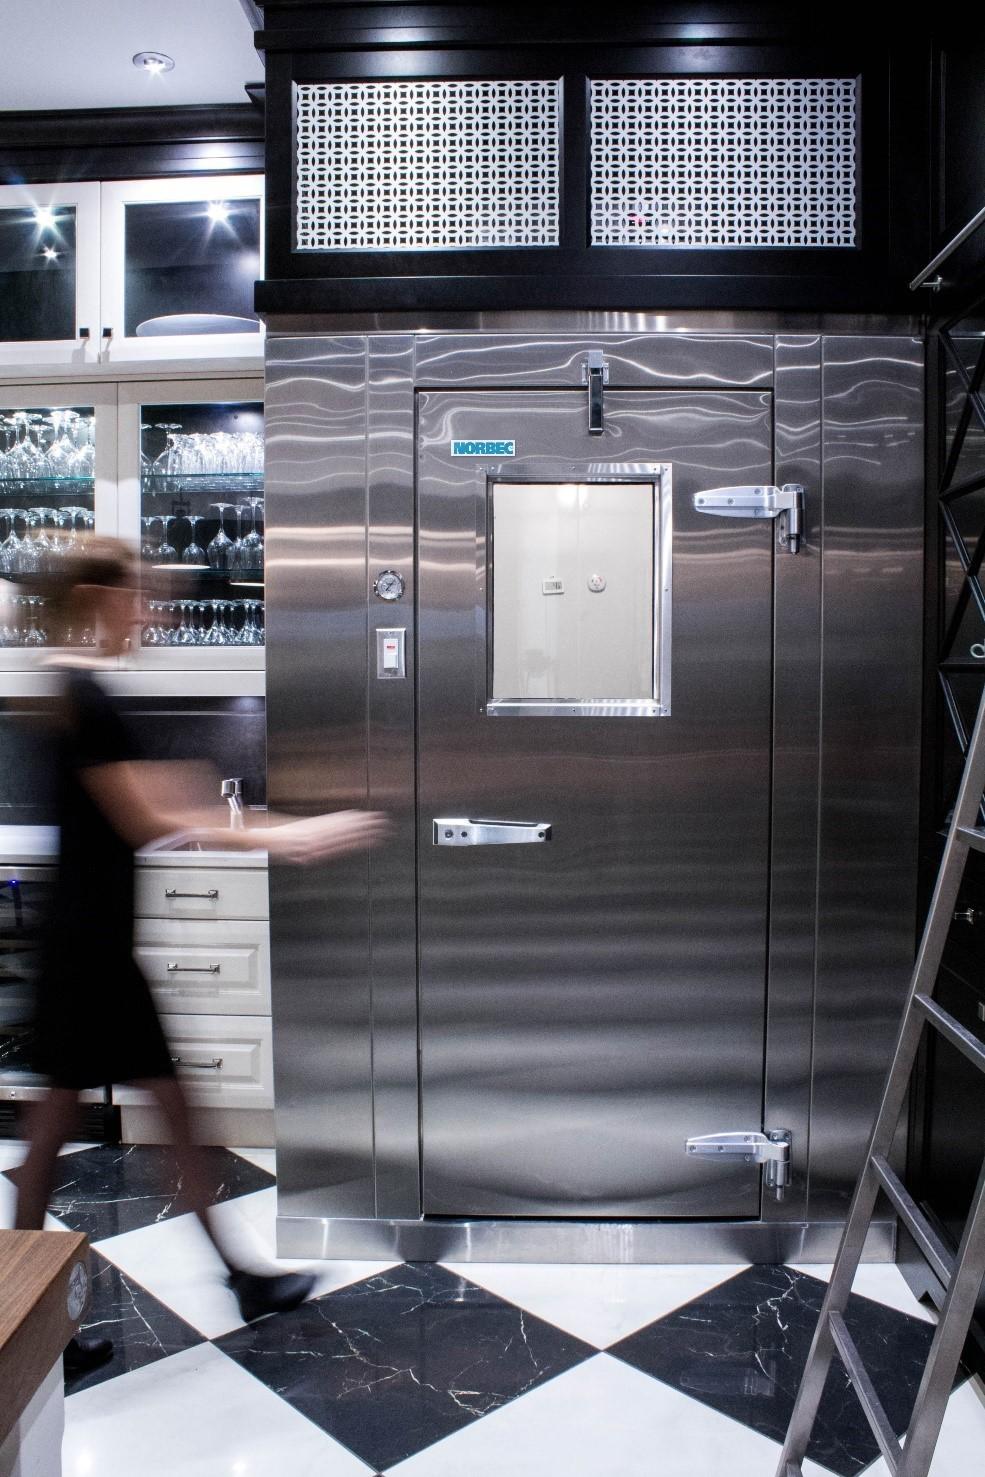 Chambre froide sur mesure chambres froides r frig ration quipement commercial doyon despr s - Chambre froide commercial ...